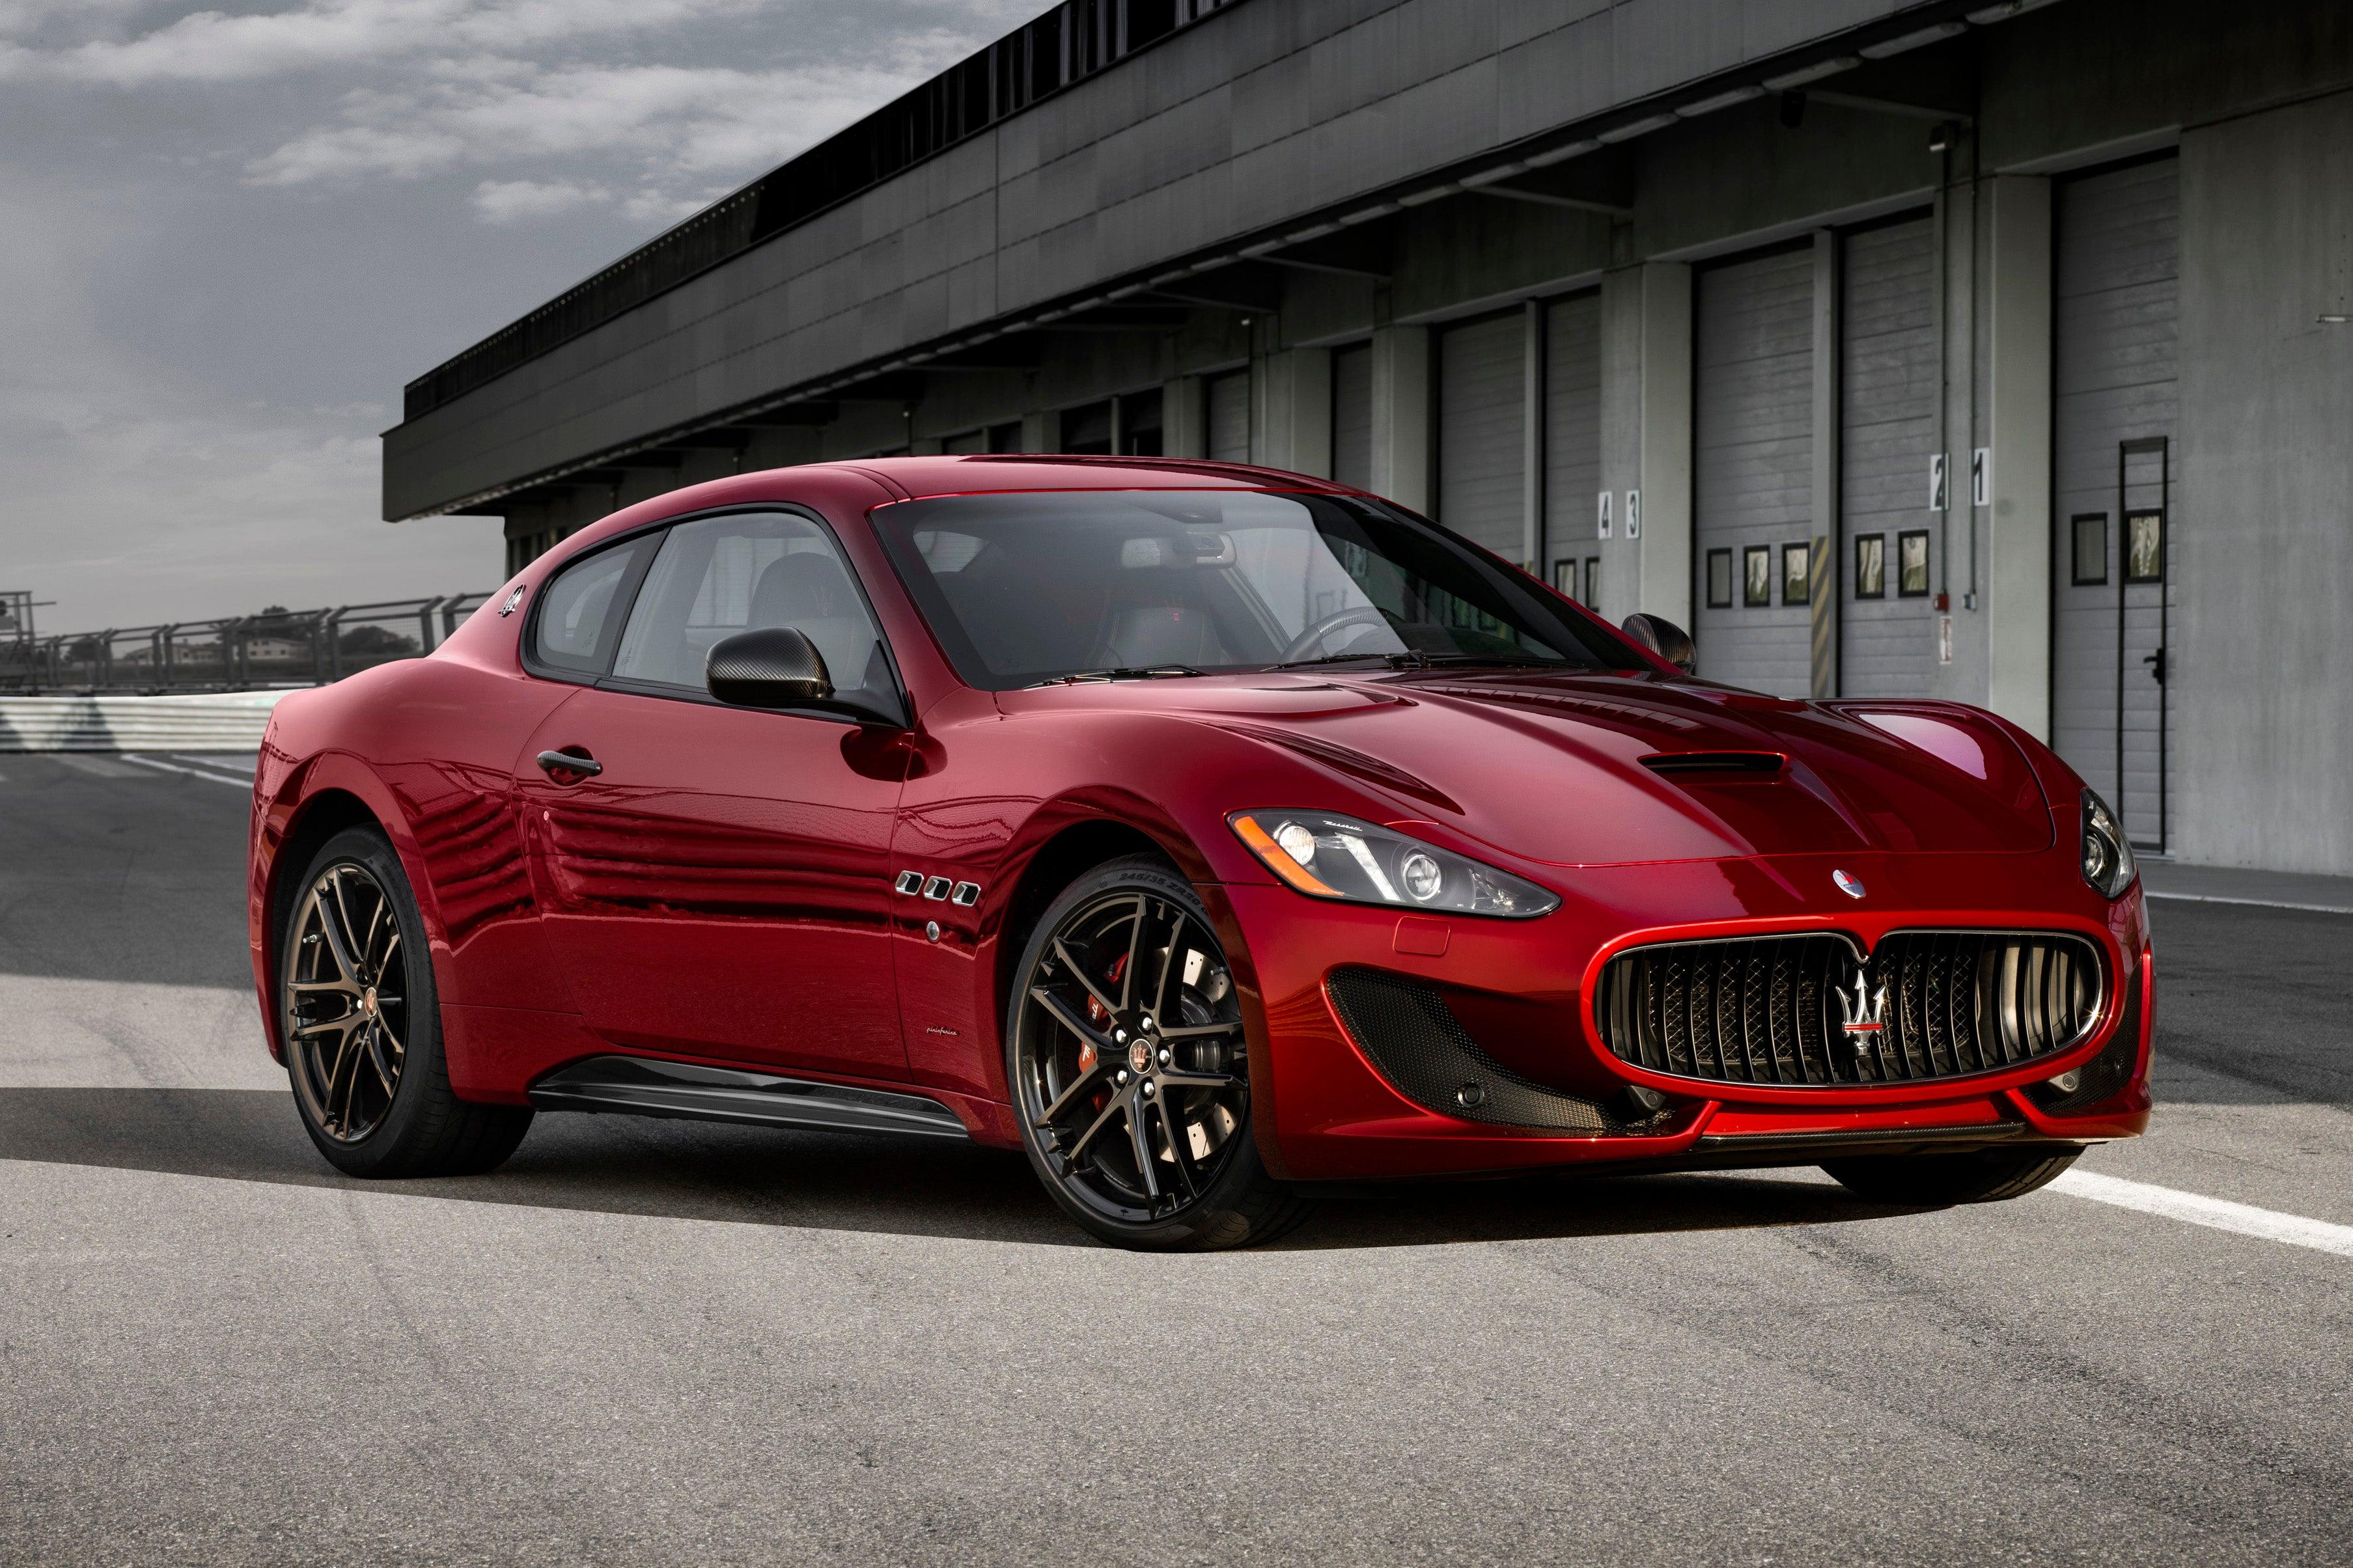 Maserati GranTurismo parked